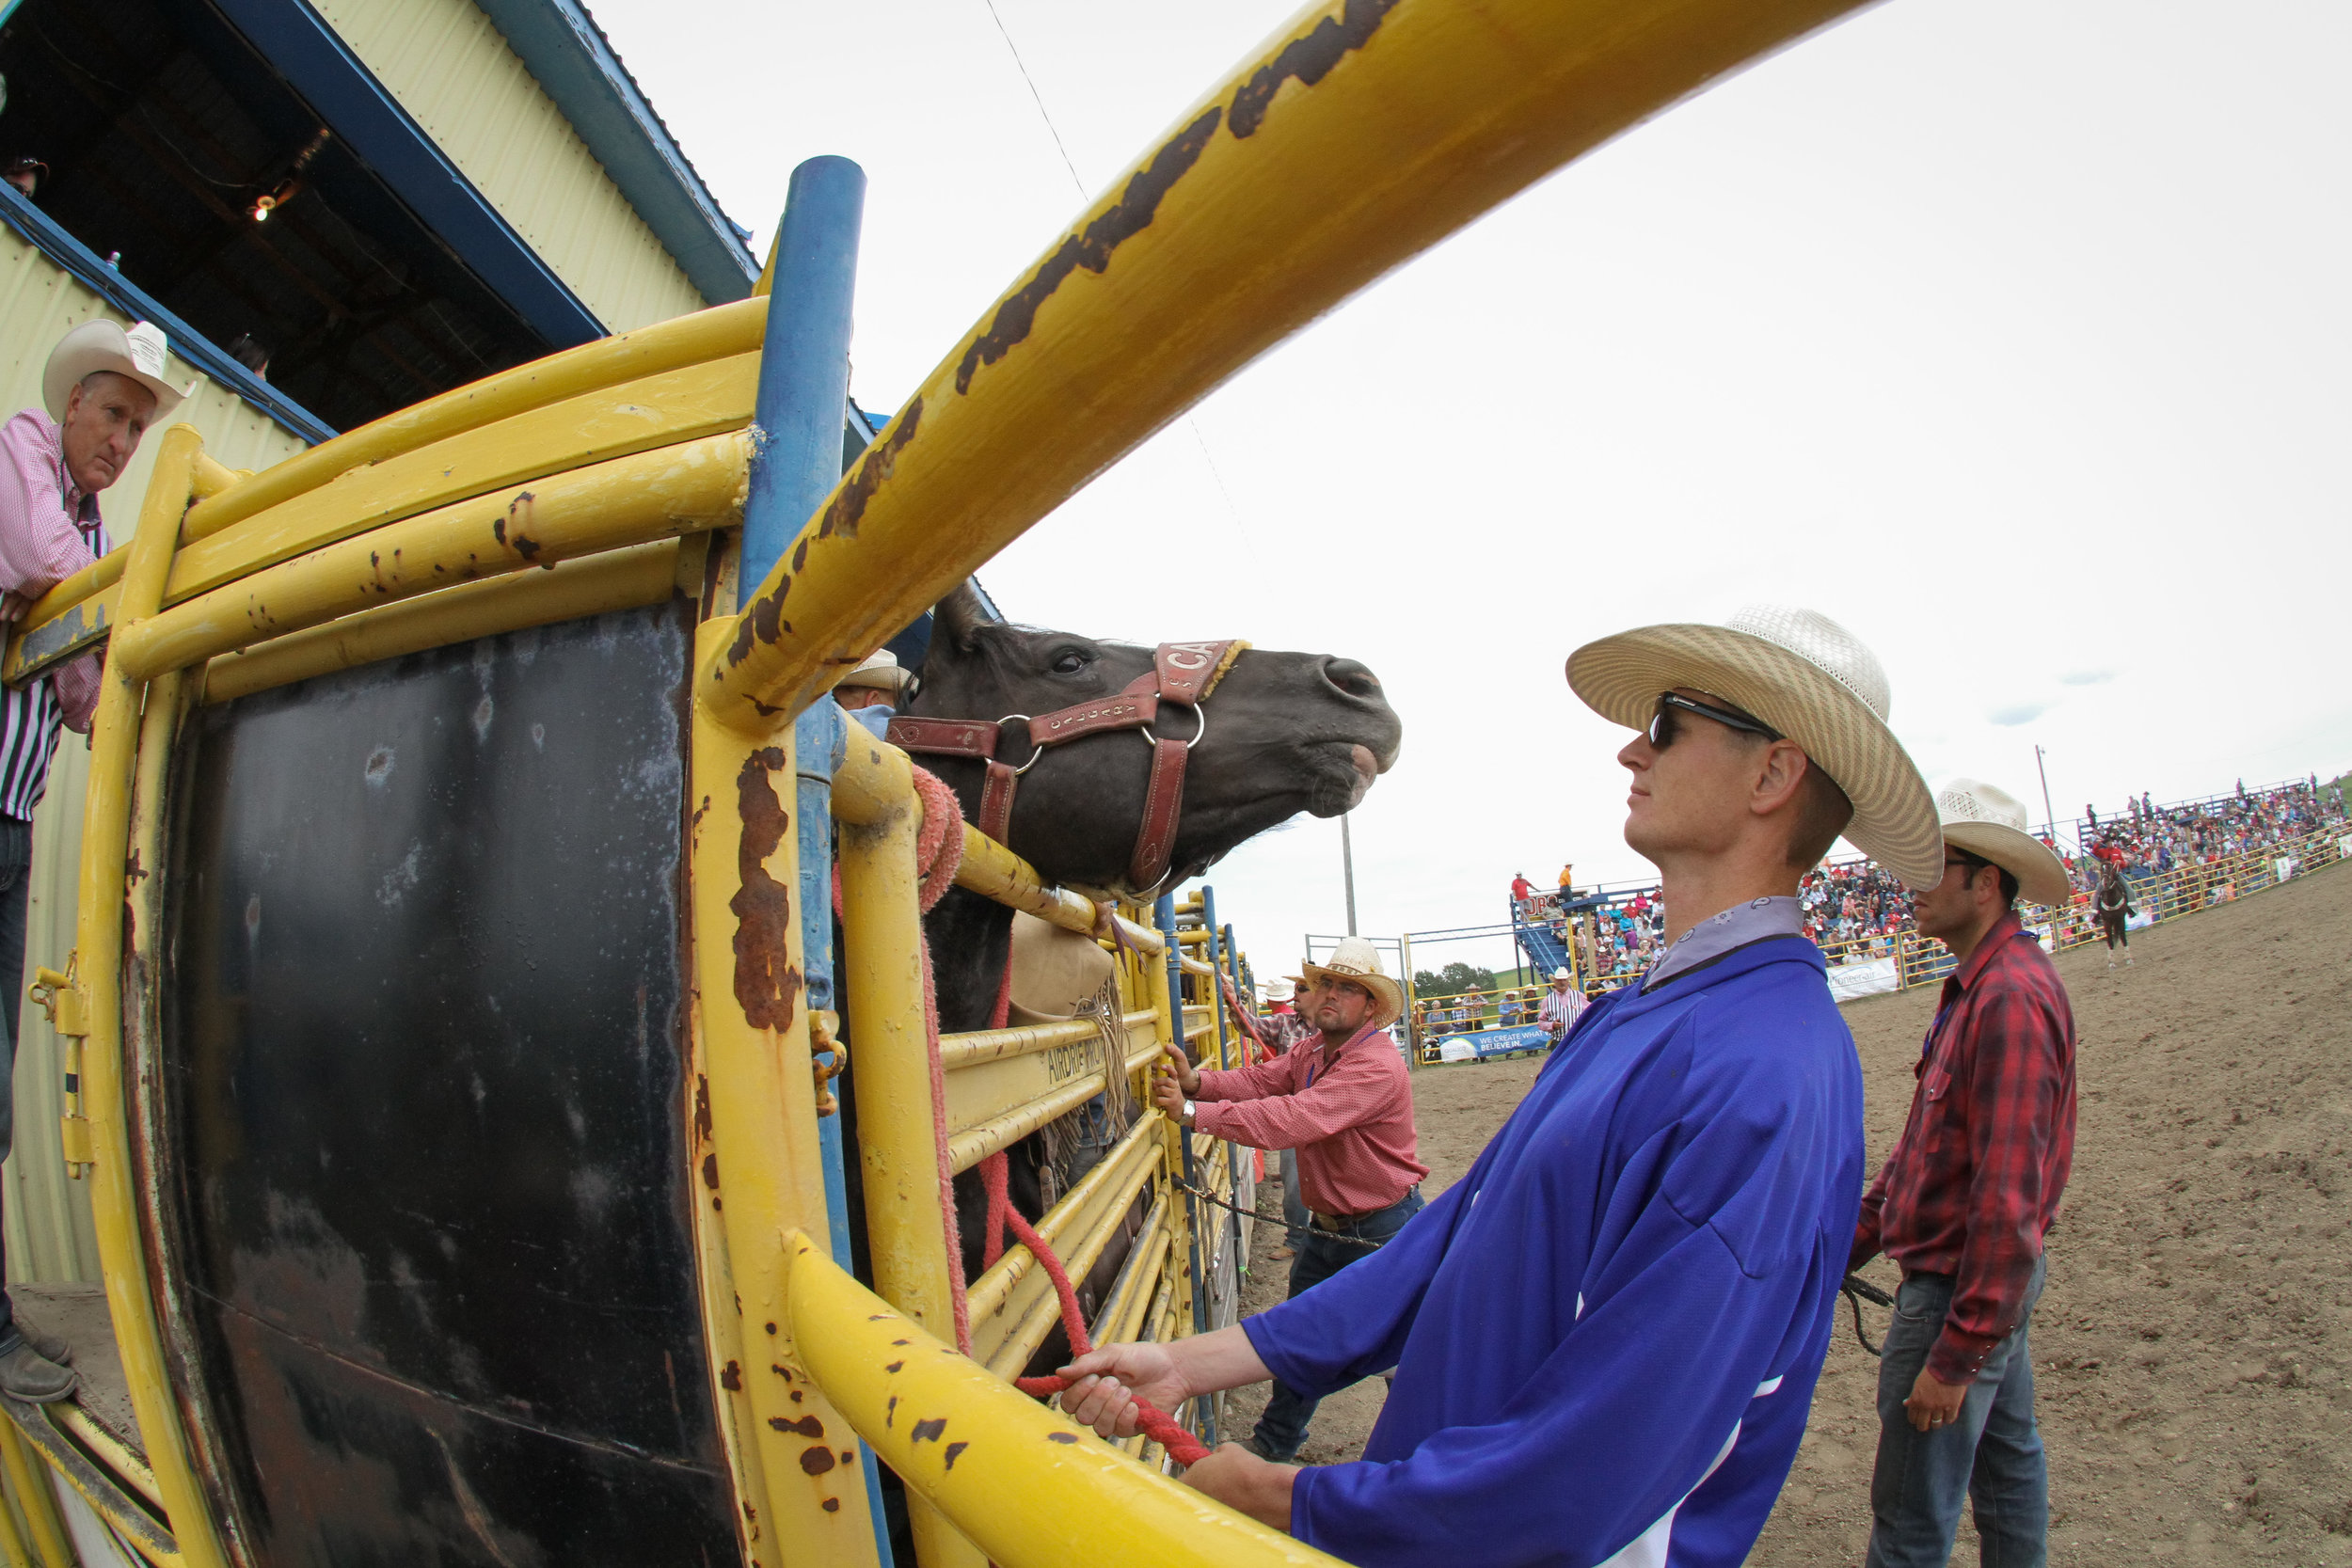 Horse at chute.jpg